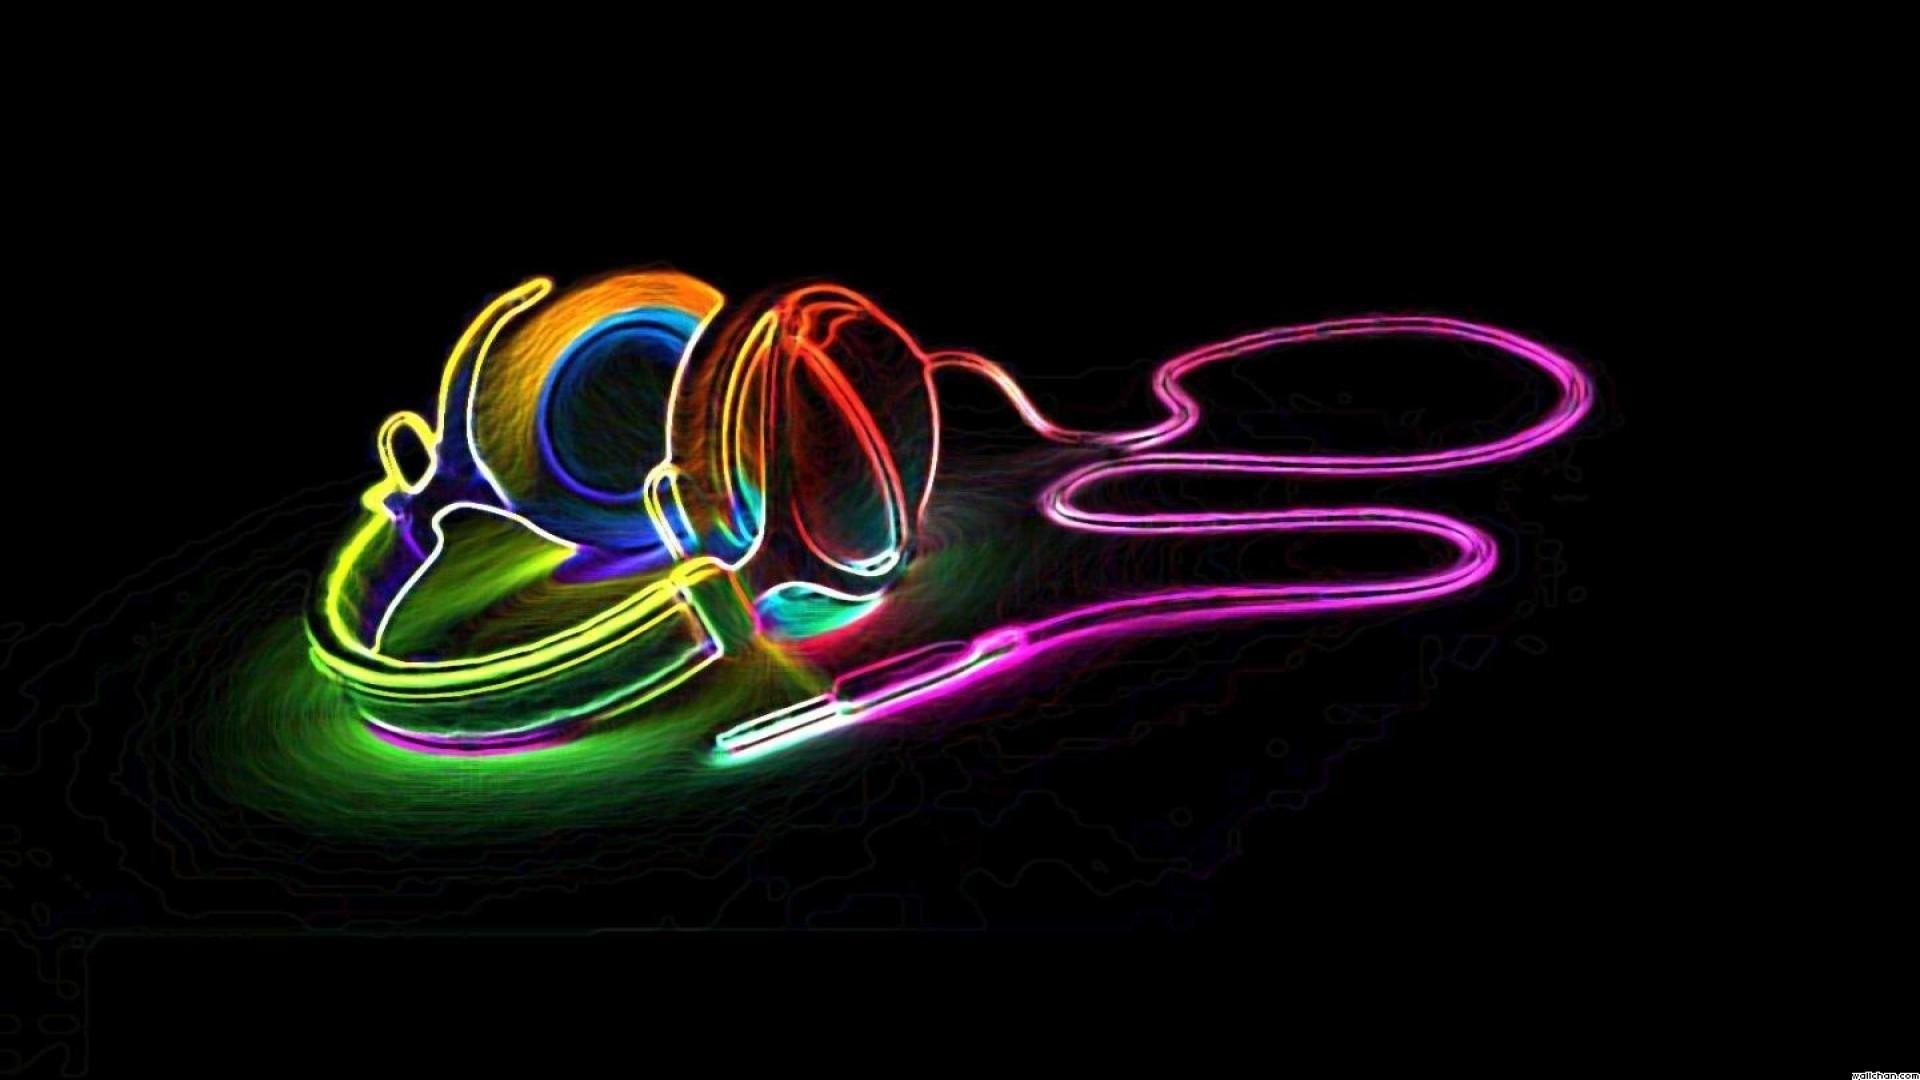 www.walldevil.com wallpapers a50 neon-headphone.jpg